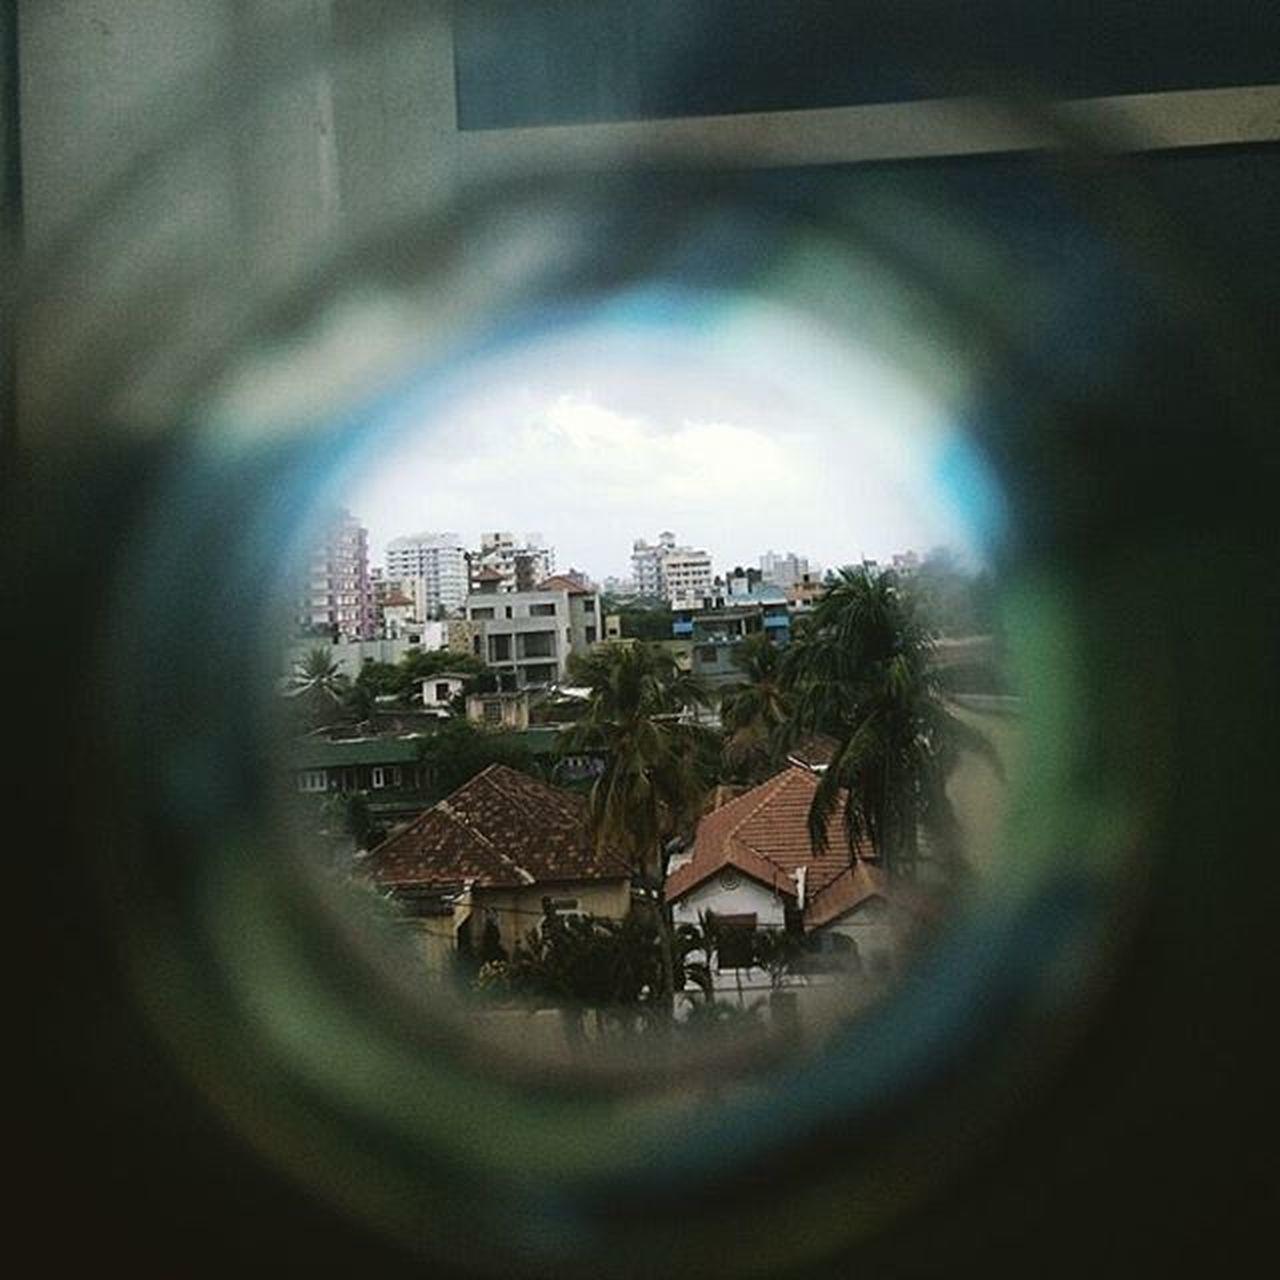 Le view through a C-hole CDhole Picskillz Oneplusphotgraphy Coloros Hobby Mybestphoto2015